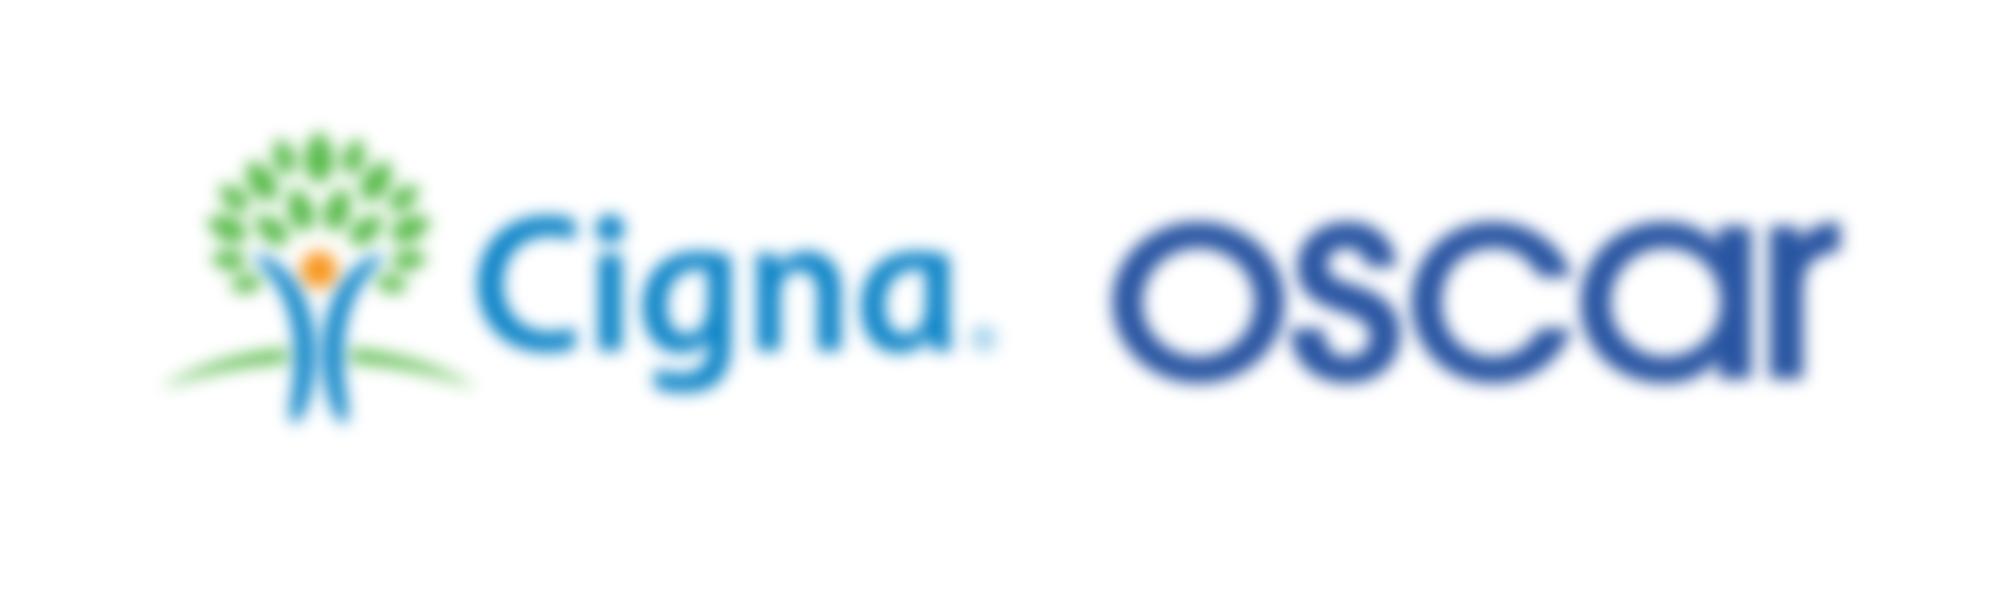 Cigna + Oscar Health Expands Reach of Affordable Small Group Health Insurance Plans